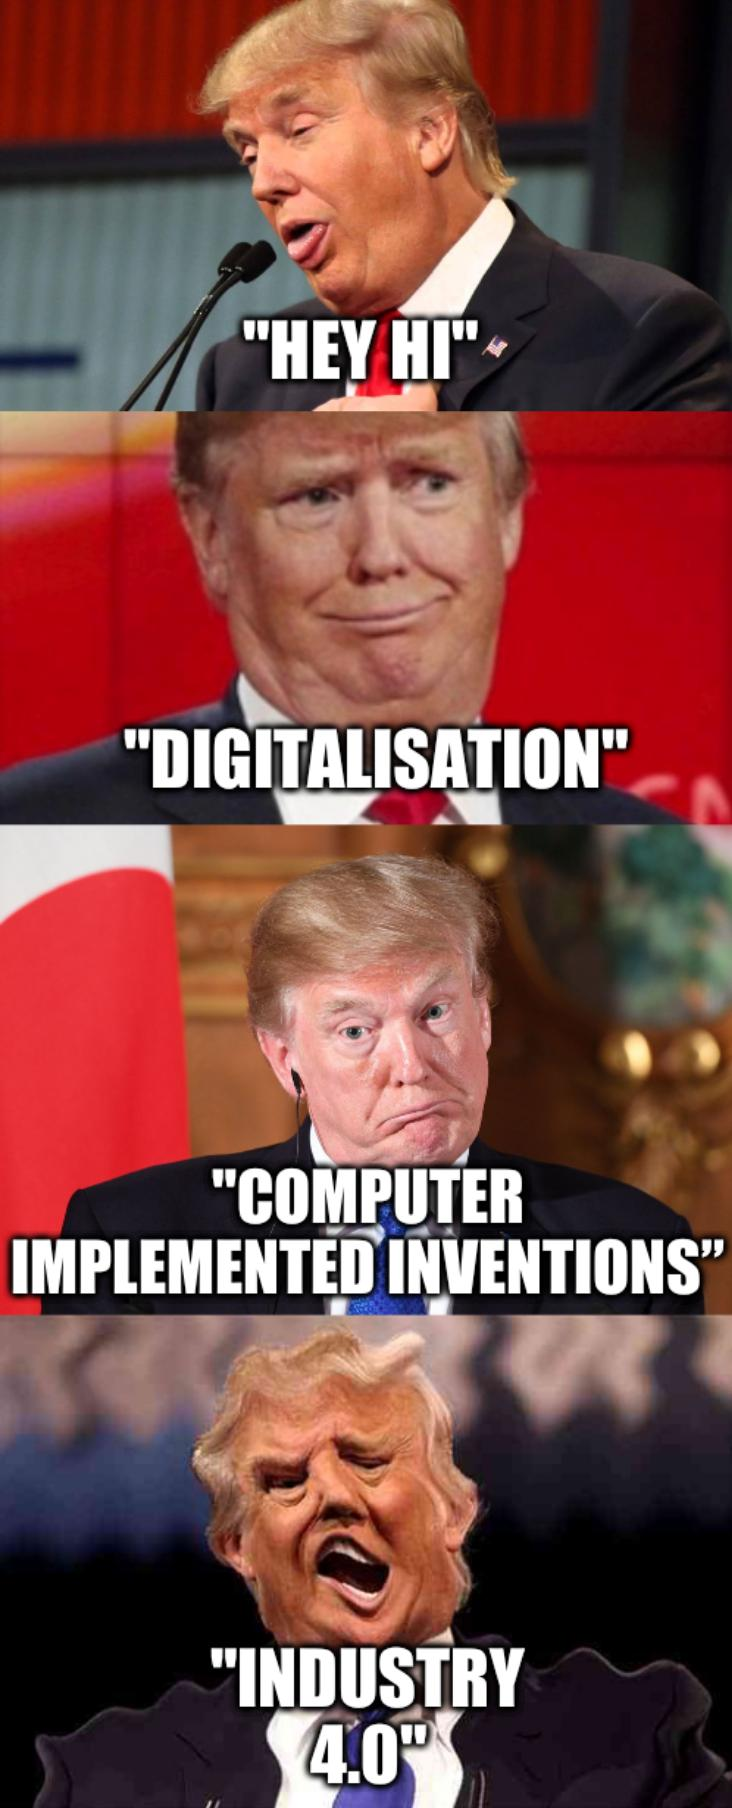 Trump: Hey hi, Industry 4.0, Digitalisation, Computer Implemented Inventions